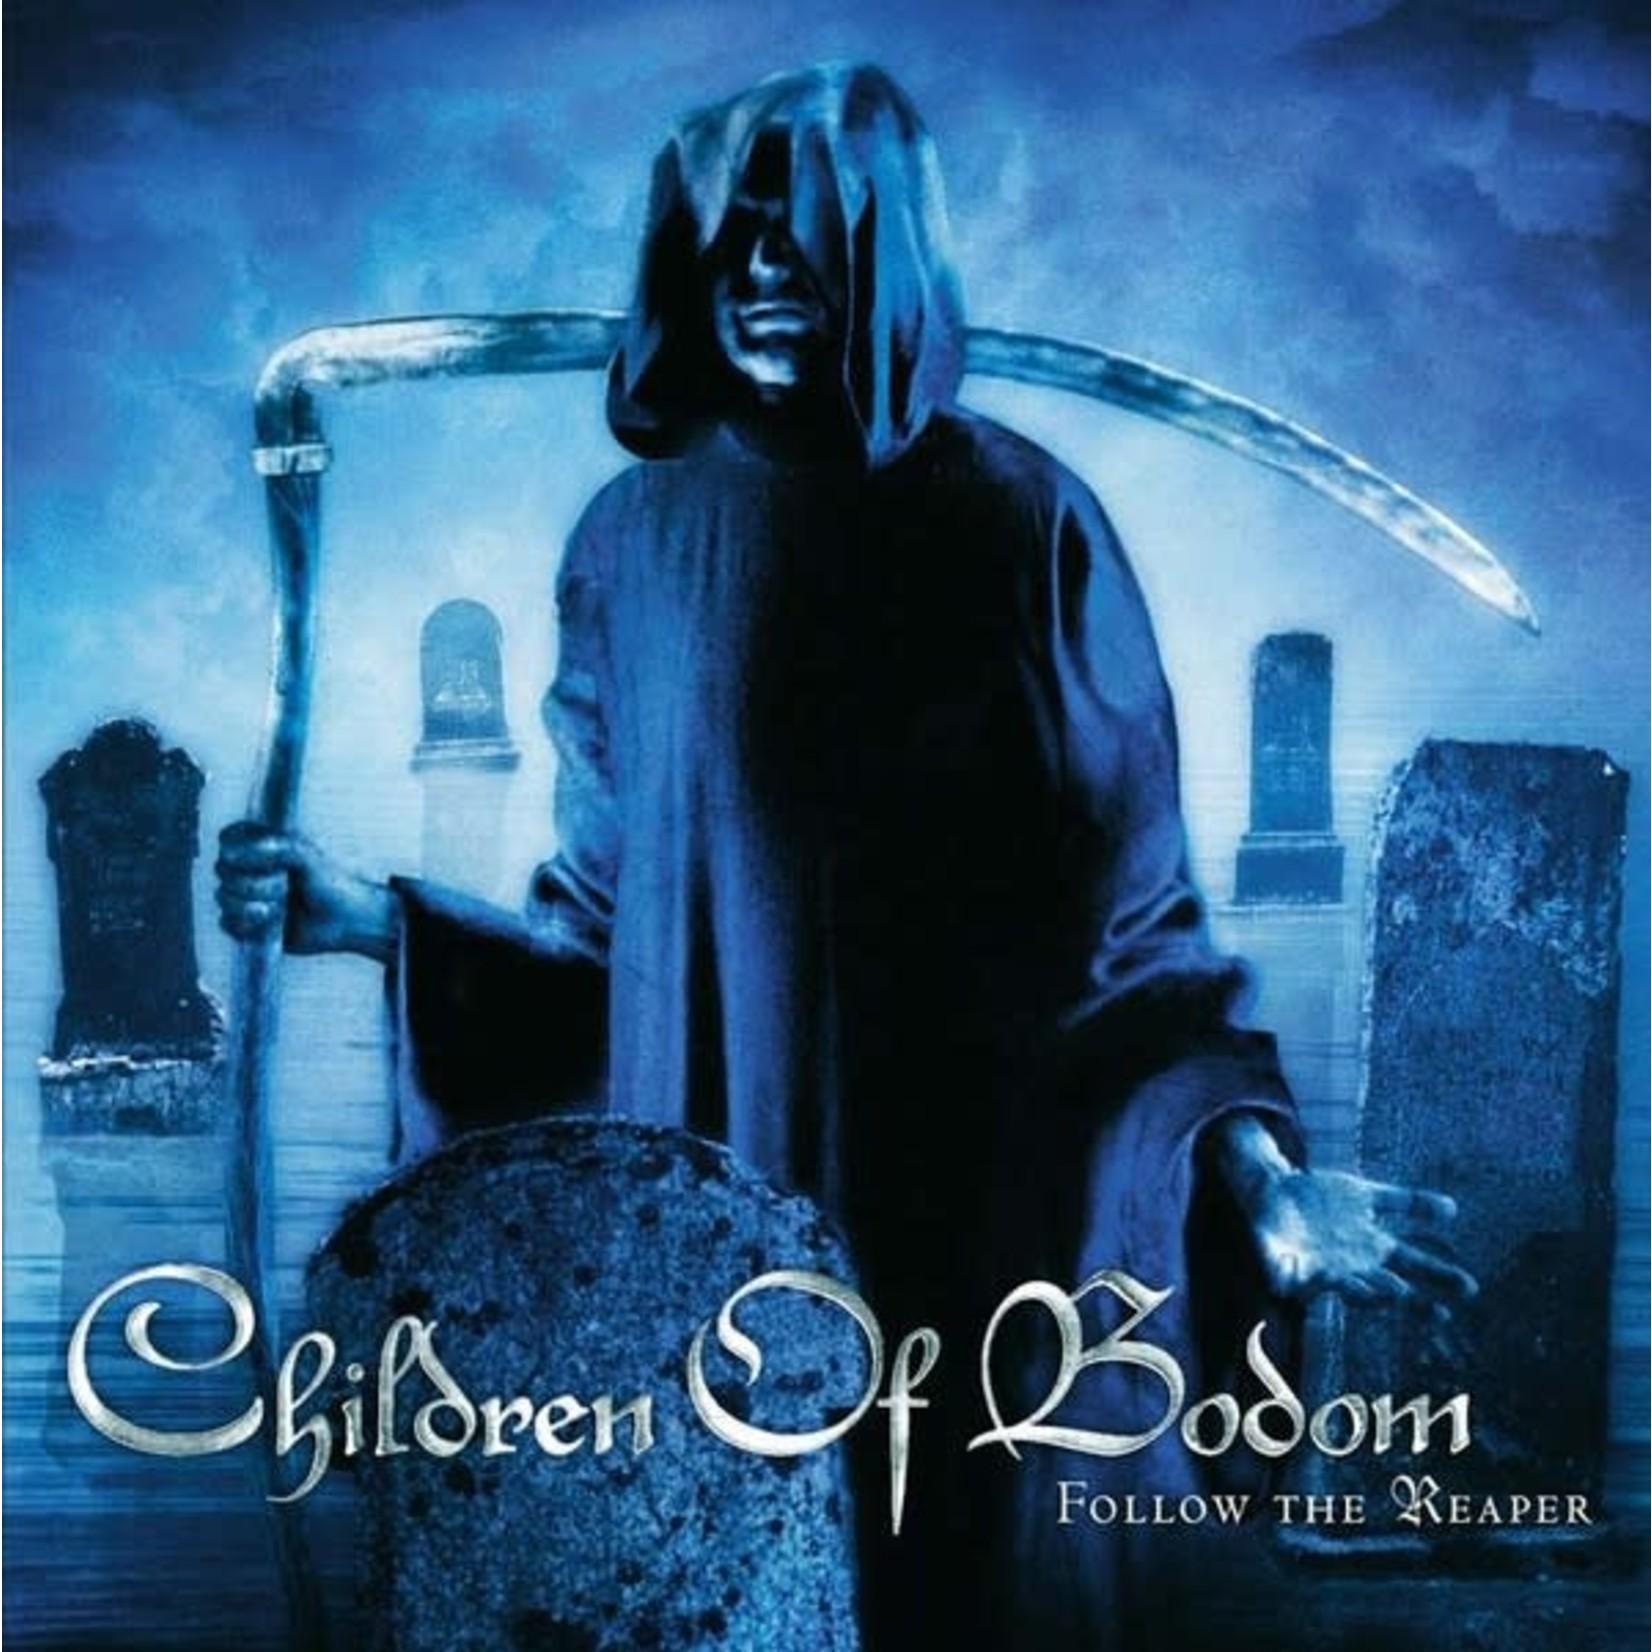 [New] Children Of Bodom: Follow The Reaper (picture disc)